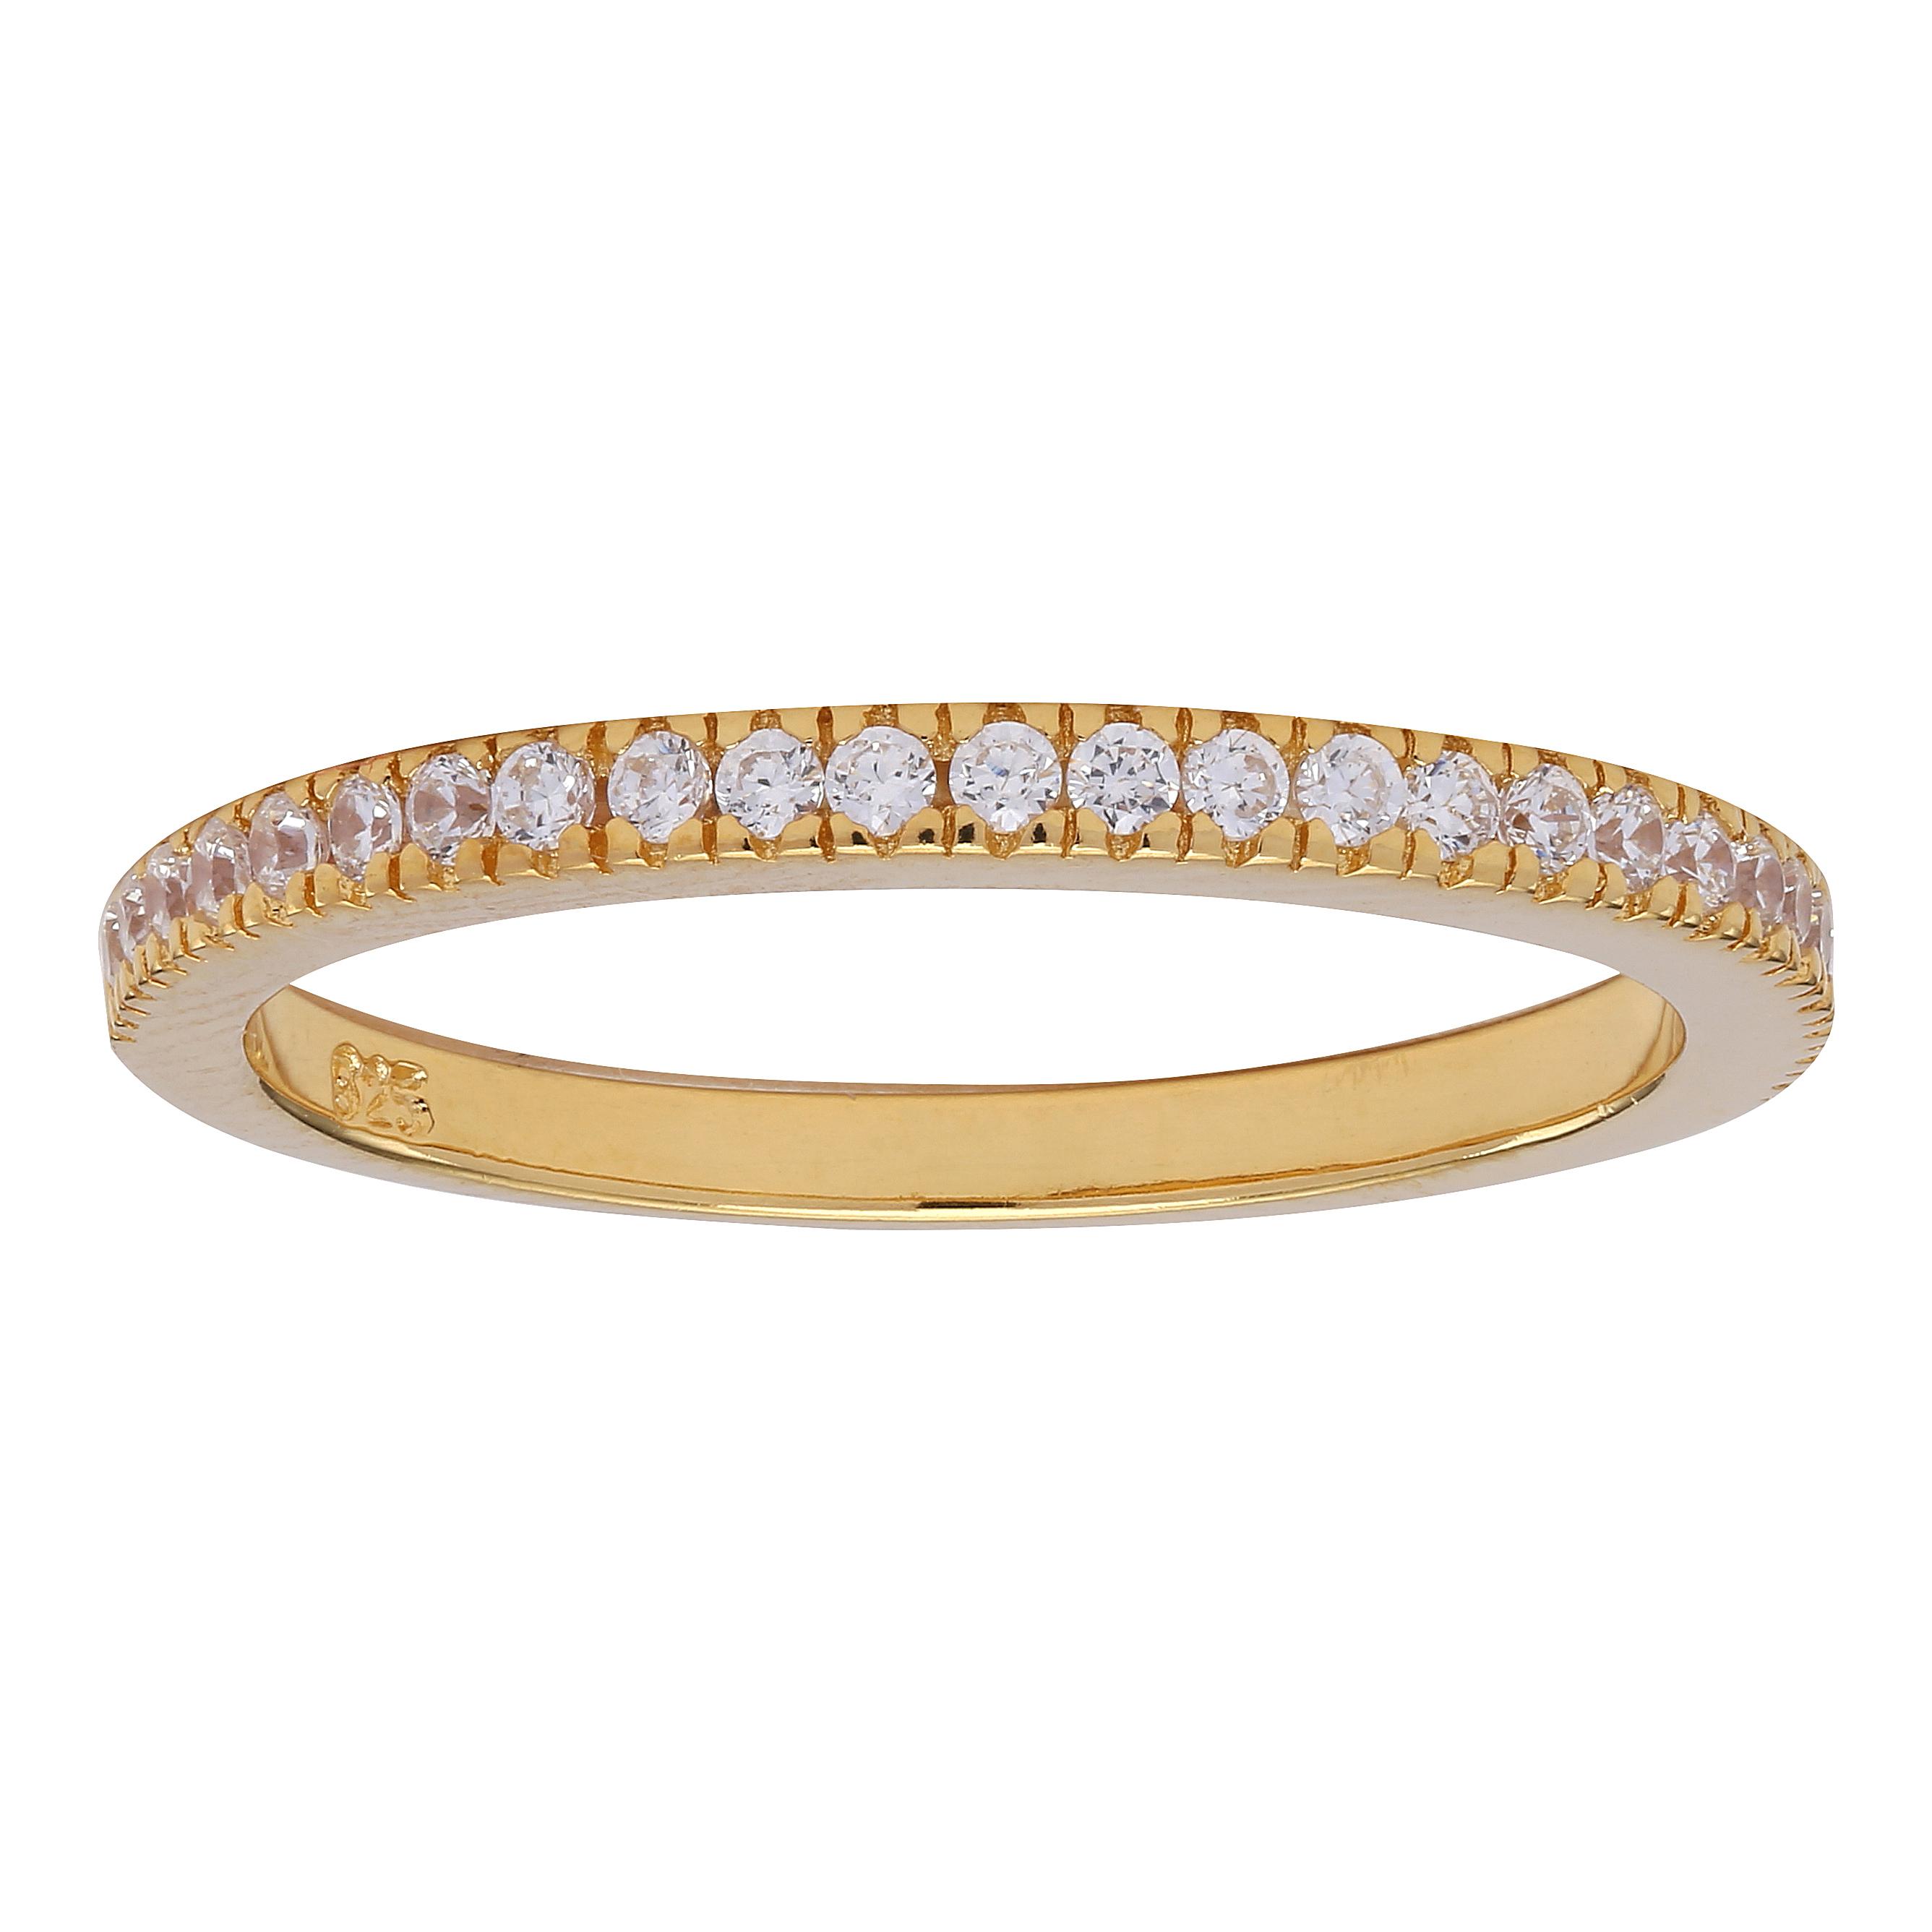 Top Joanli Nor Frost Gold Ring mit Steinen zum Kombinieren @SZ_44